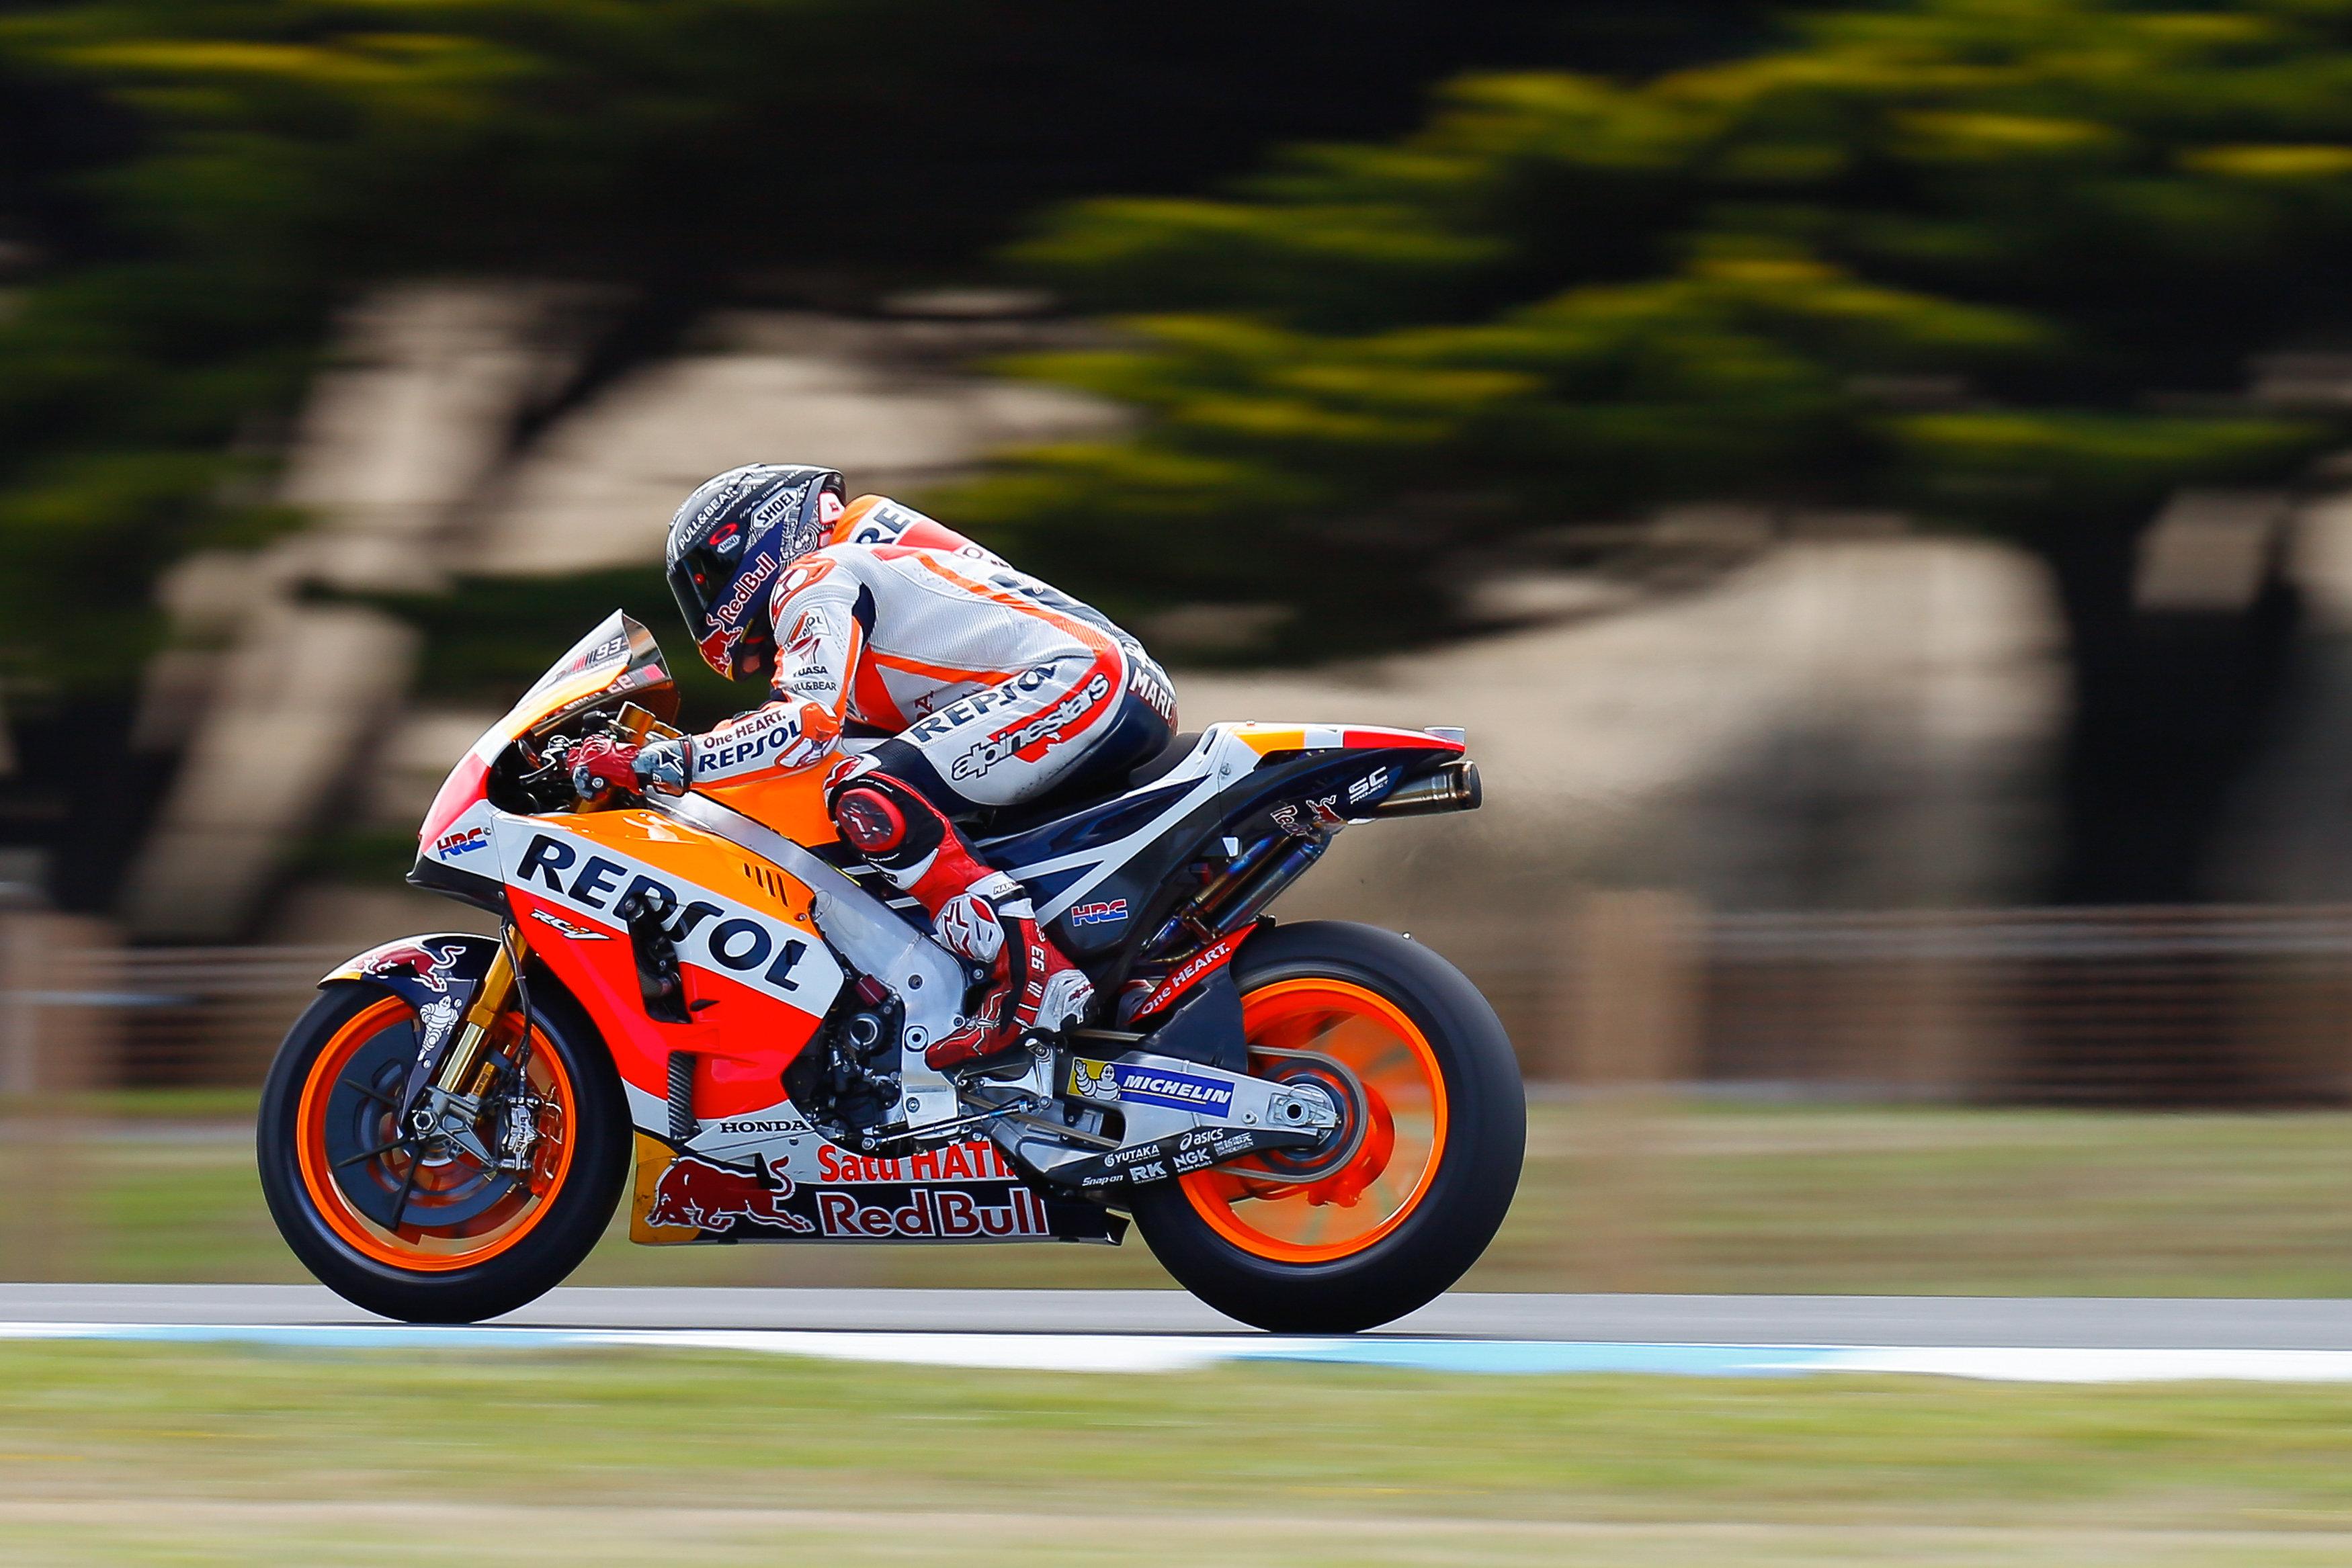 Marquez 2017 Australian Moto GP Testing At Phillip Island